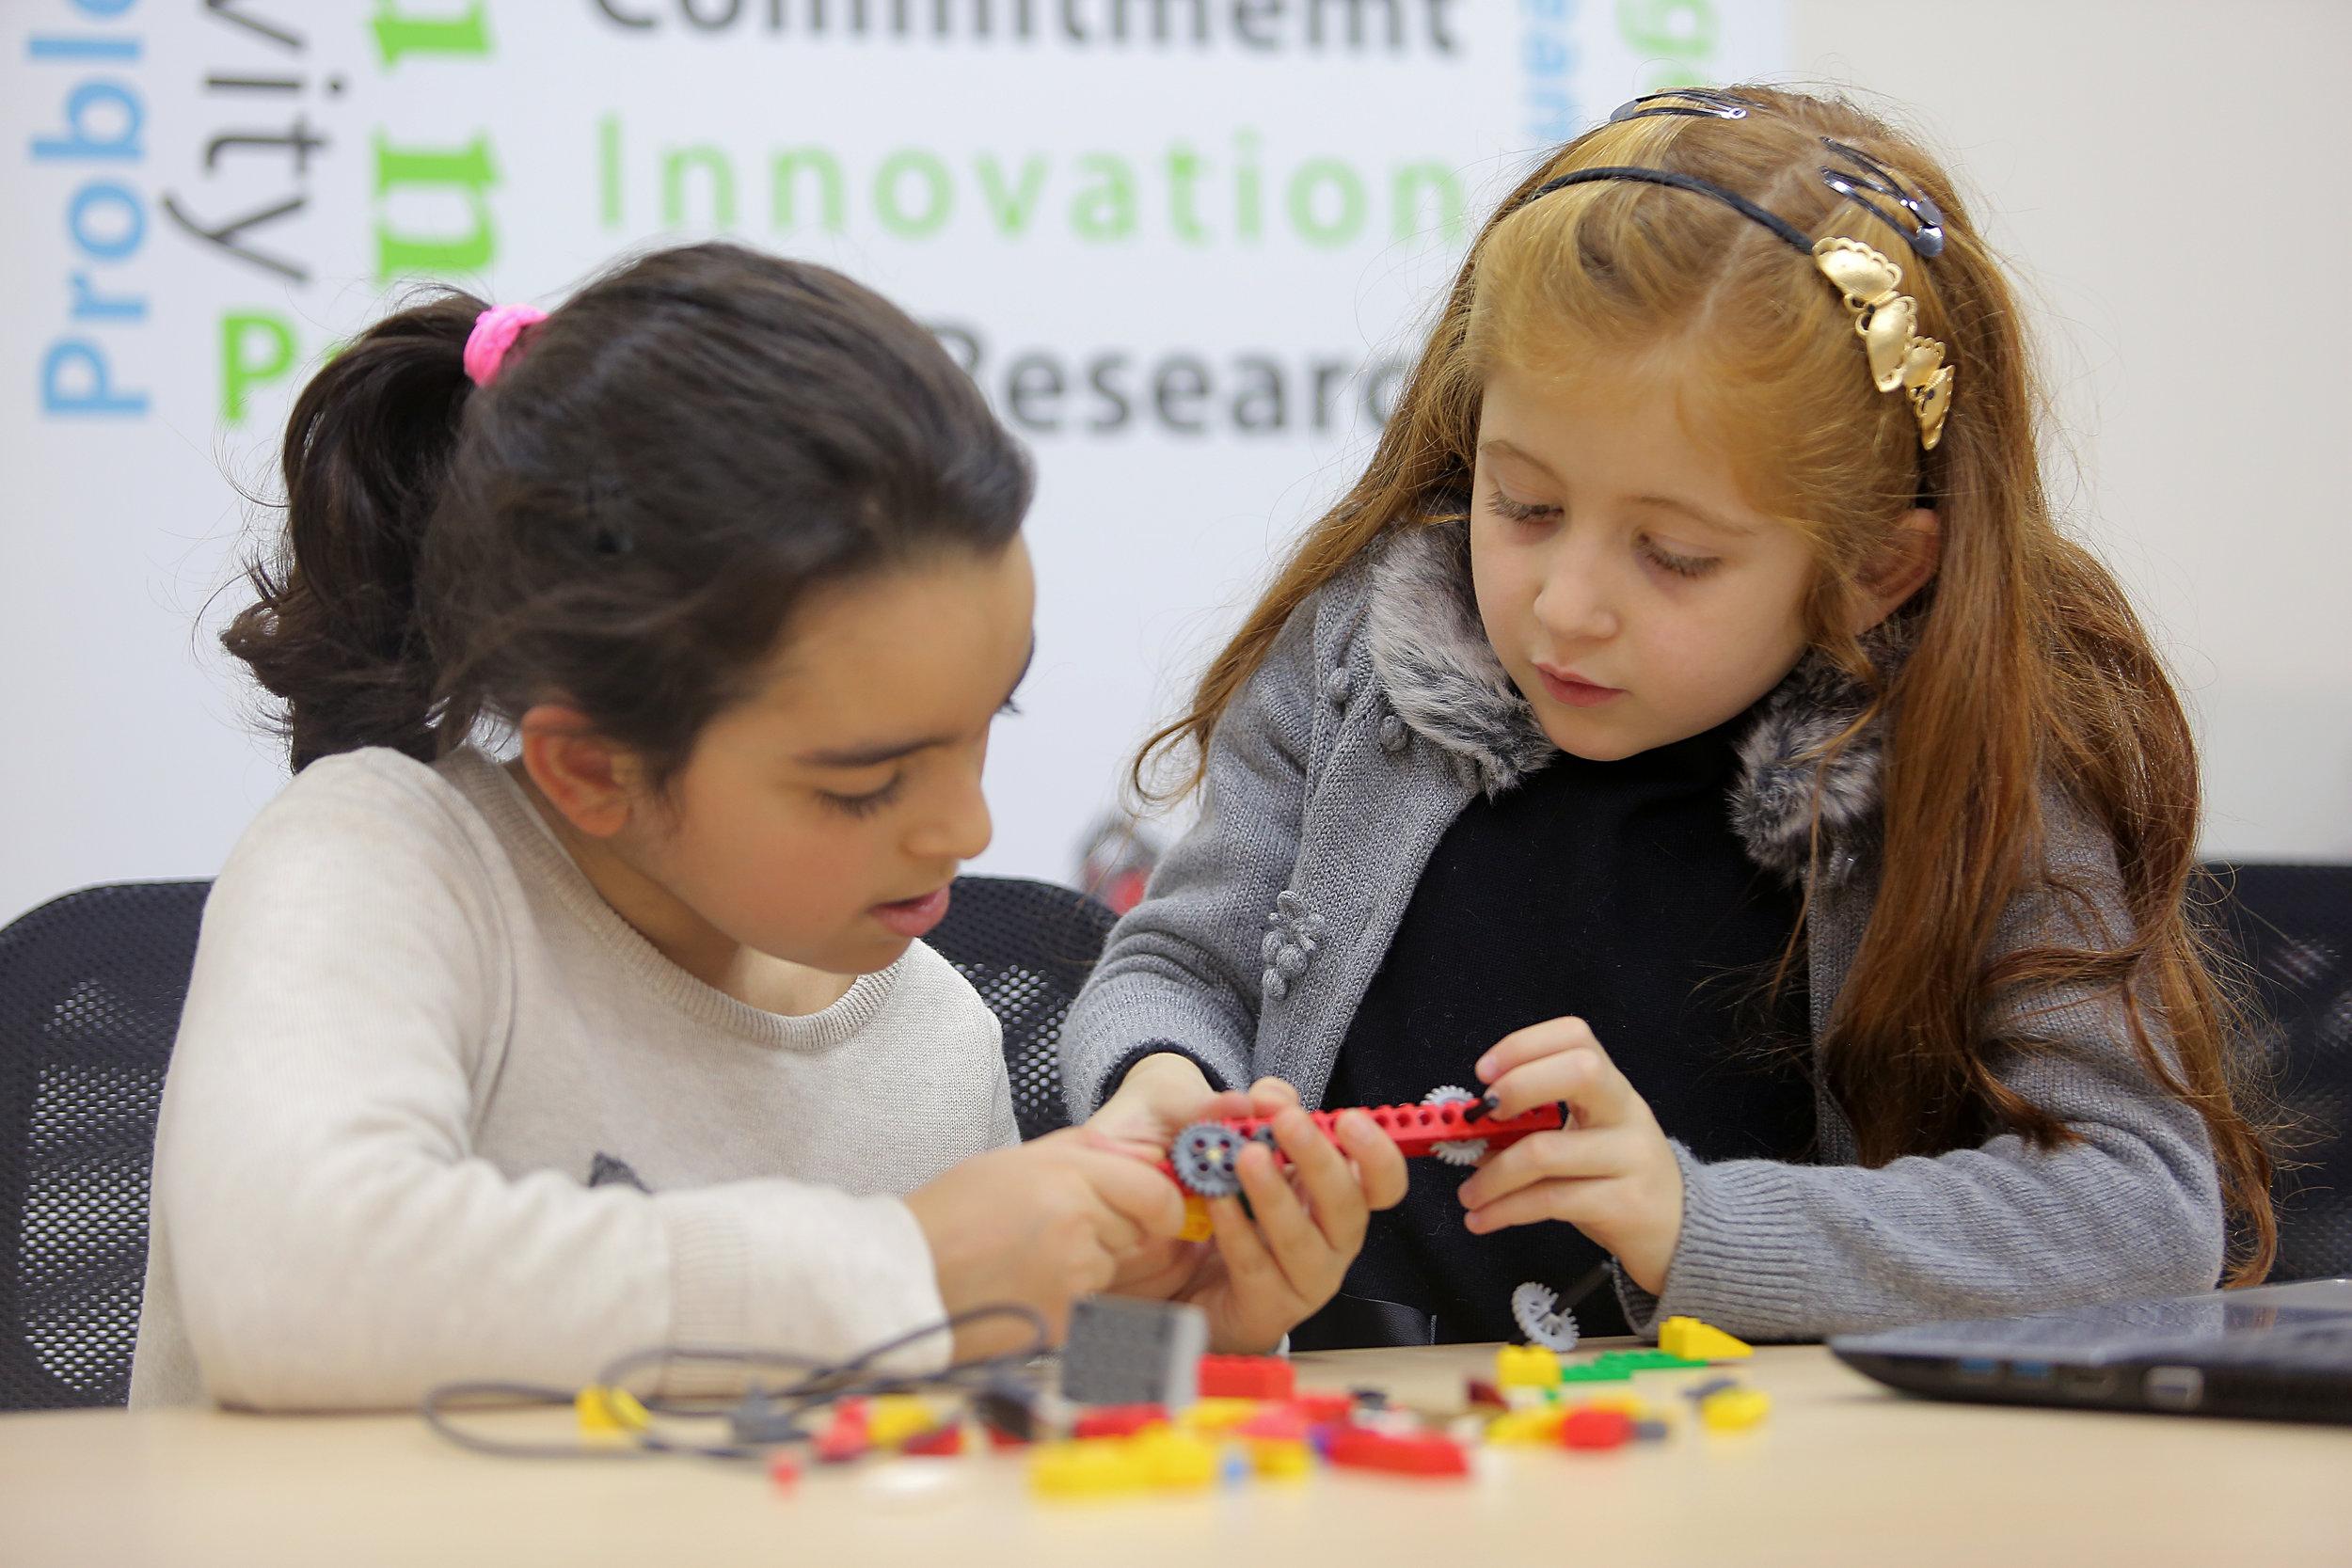 Sumaya & Mariam constructing a crane during a WeDo course